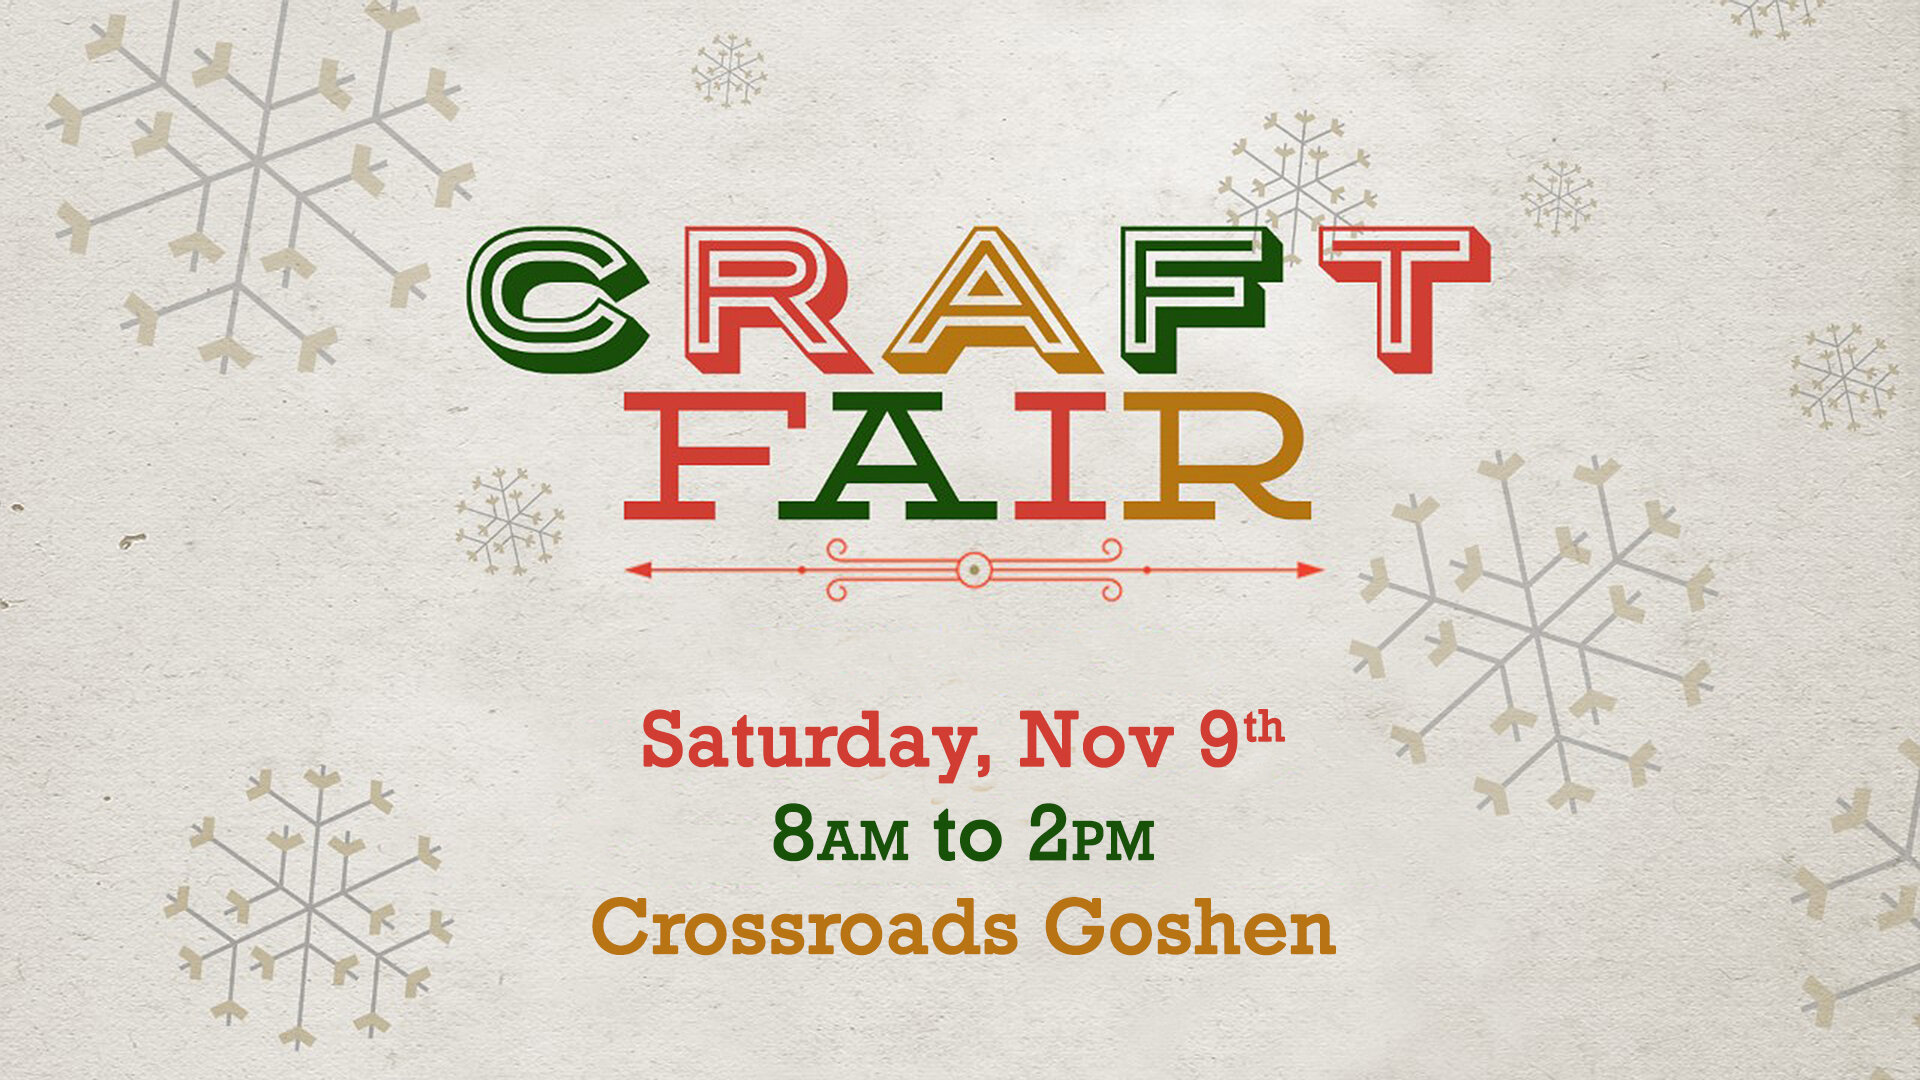 Copy of Craft Fair